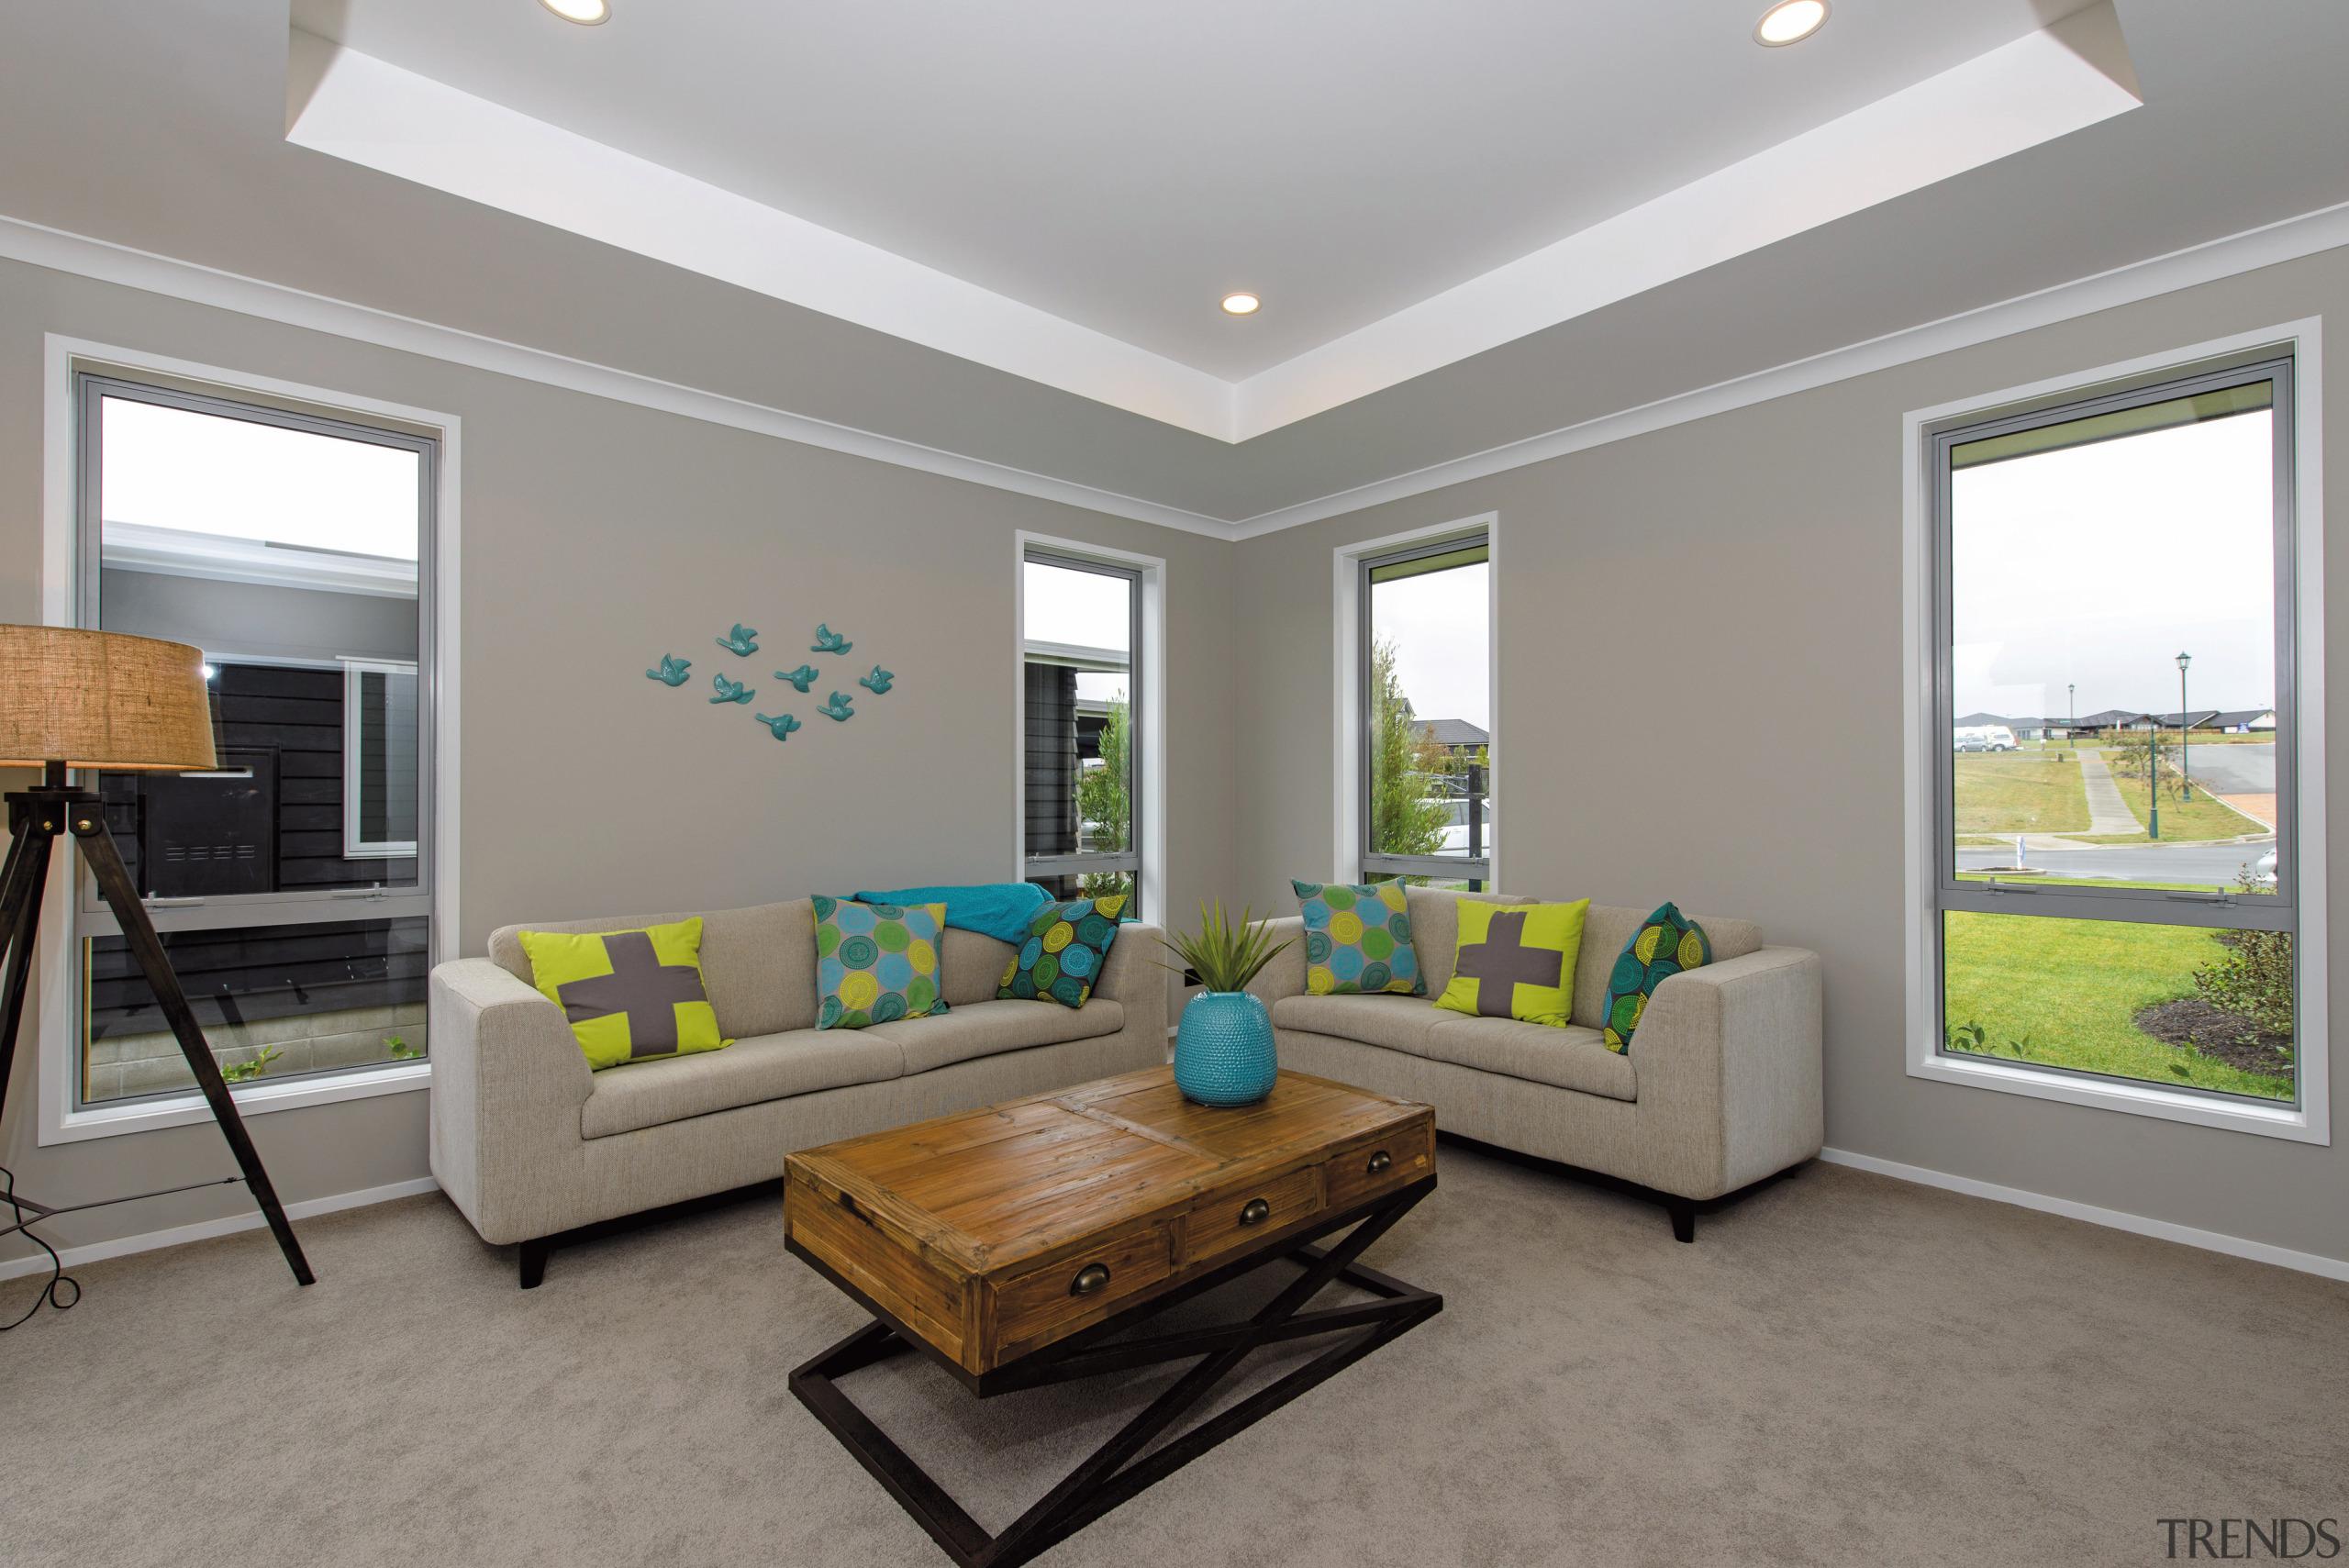 GJ Gardner Homes show home living - GJ estate, home, house, interior design, living room, real estate, room, window, gray